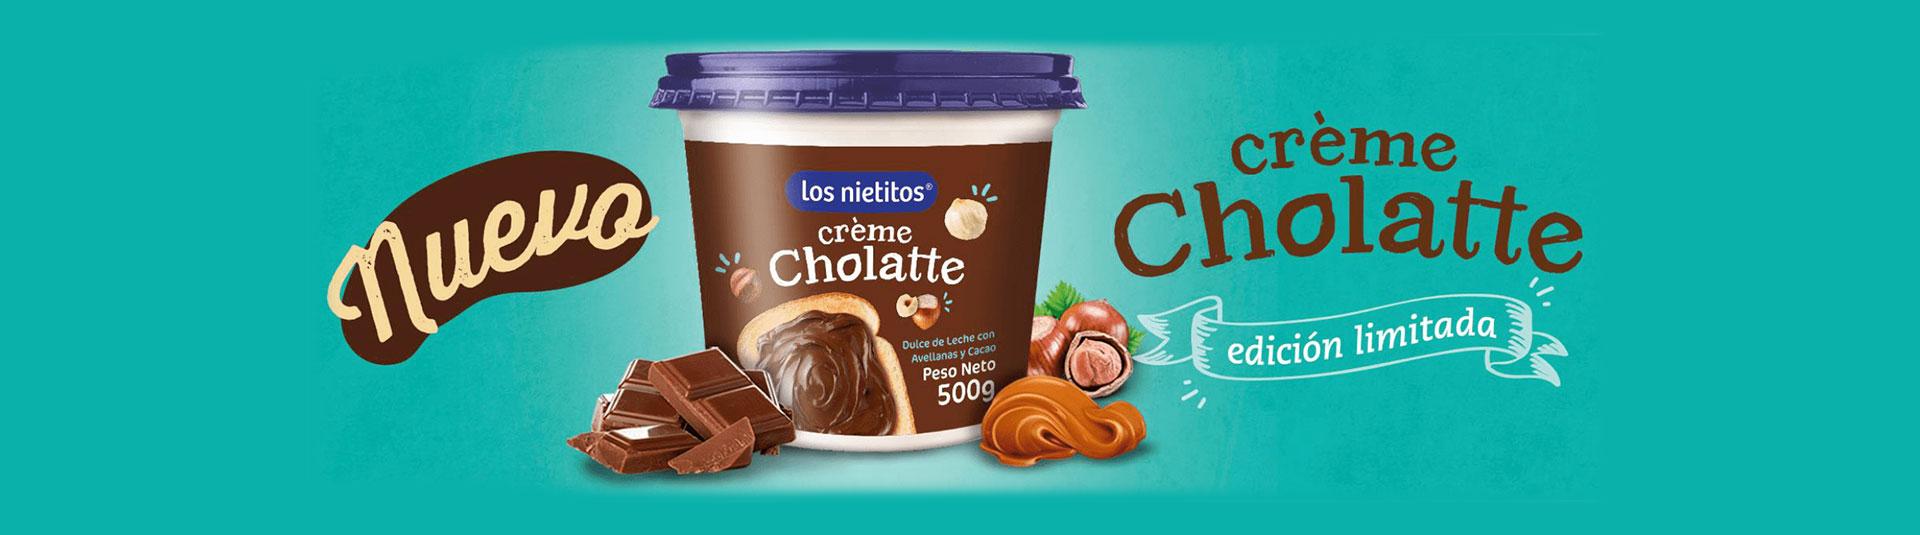 Nuevo Crème Cholatte